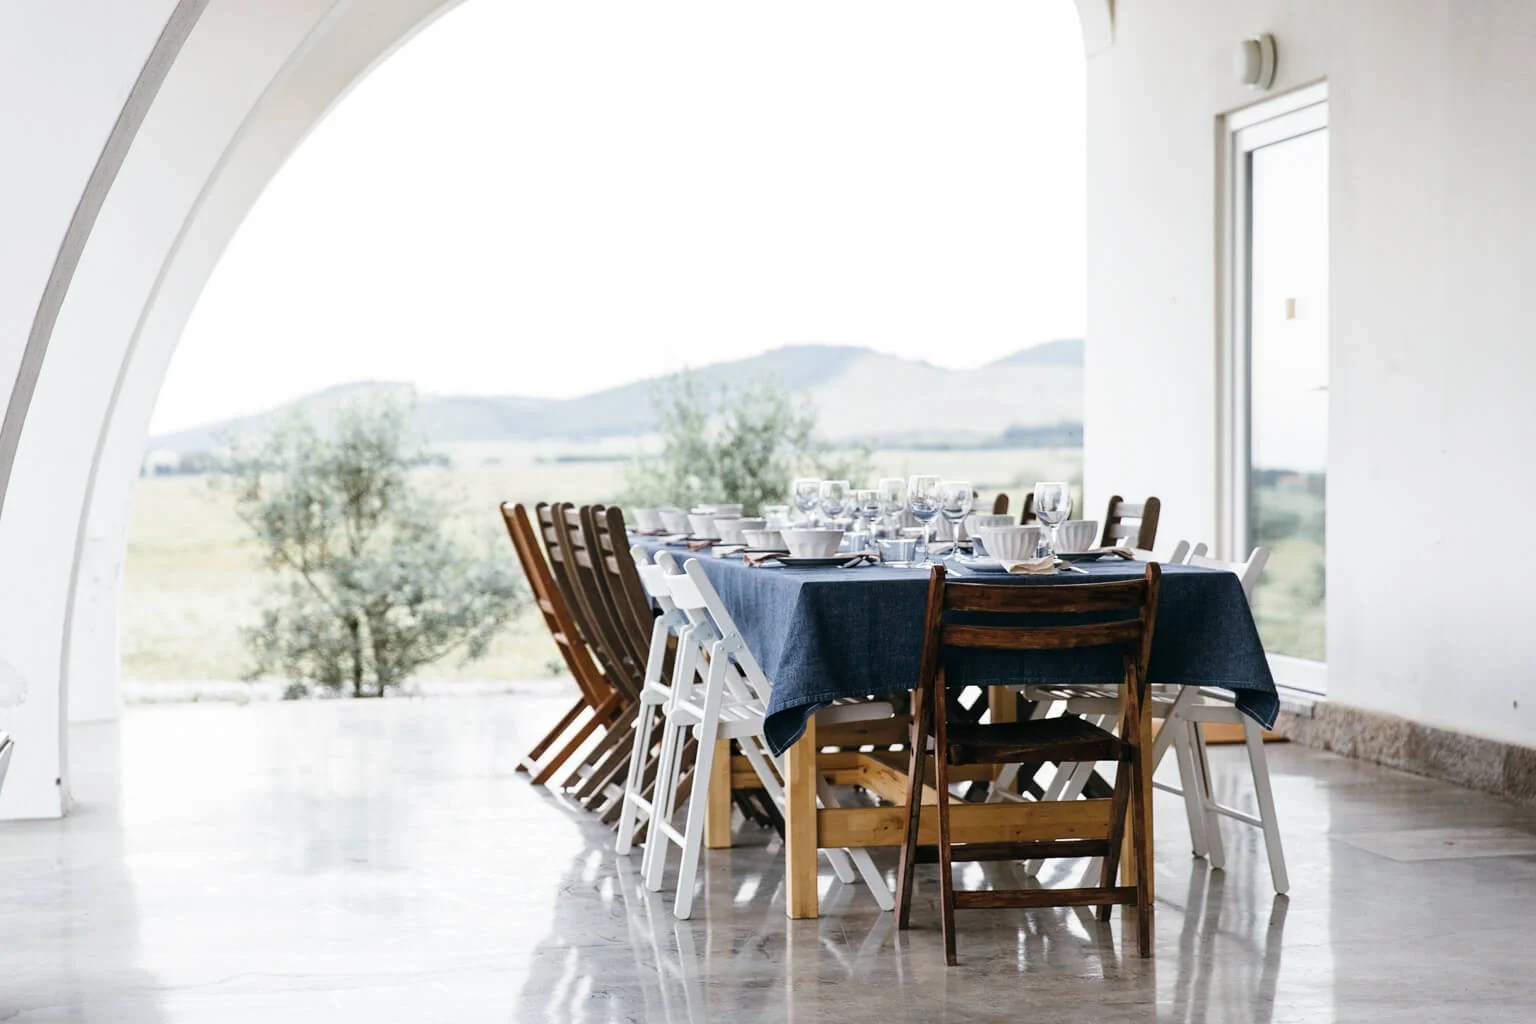 Food & Lifestyle Photography Workshop: Alentejo, Portugal